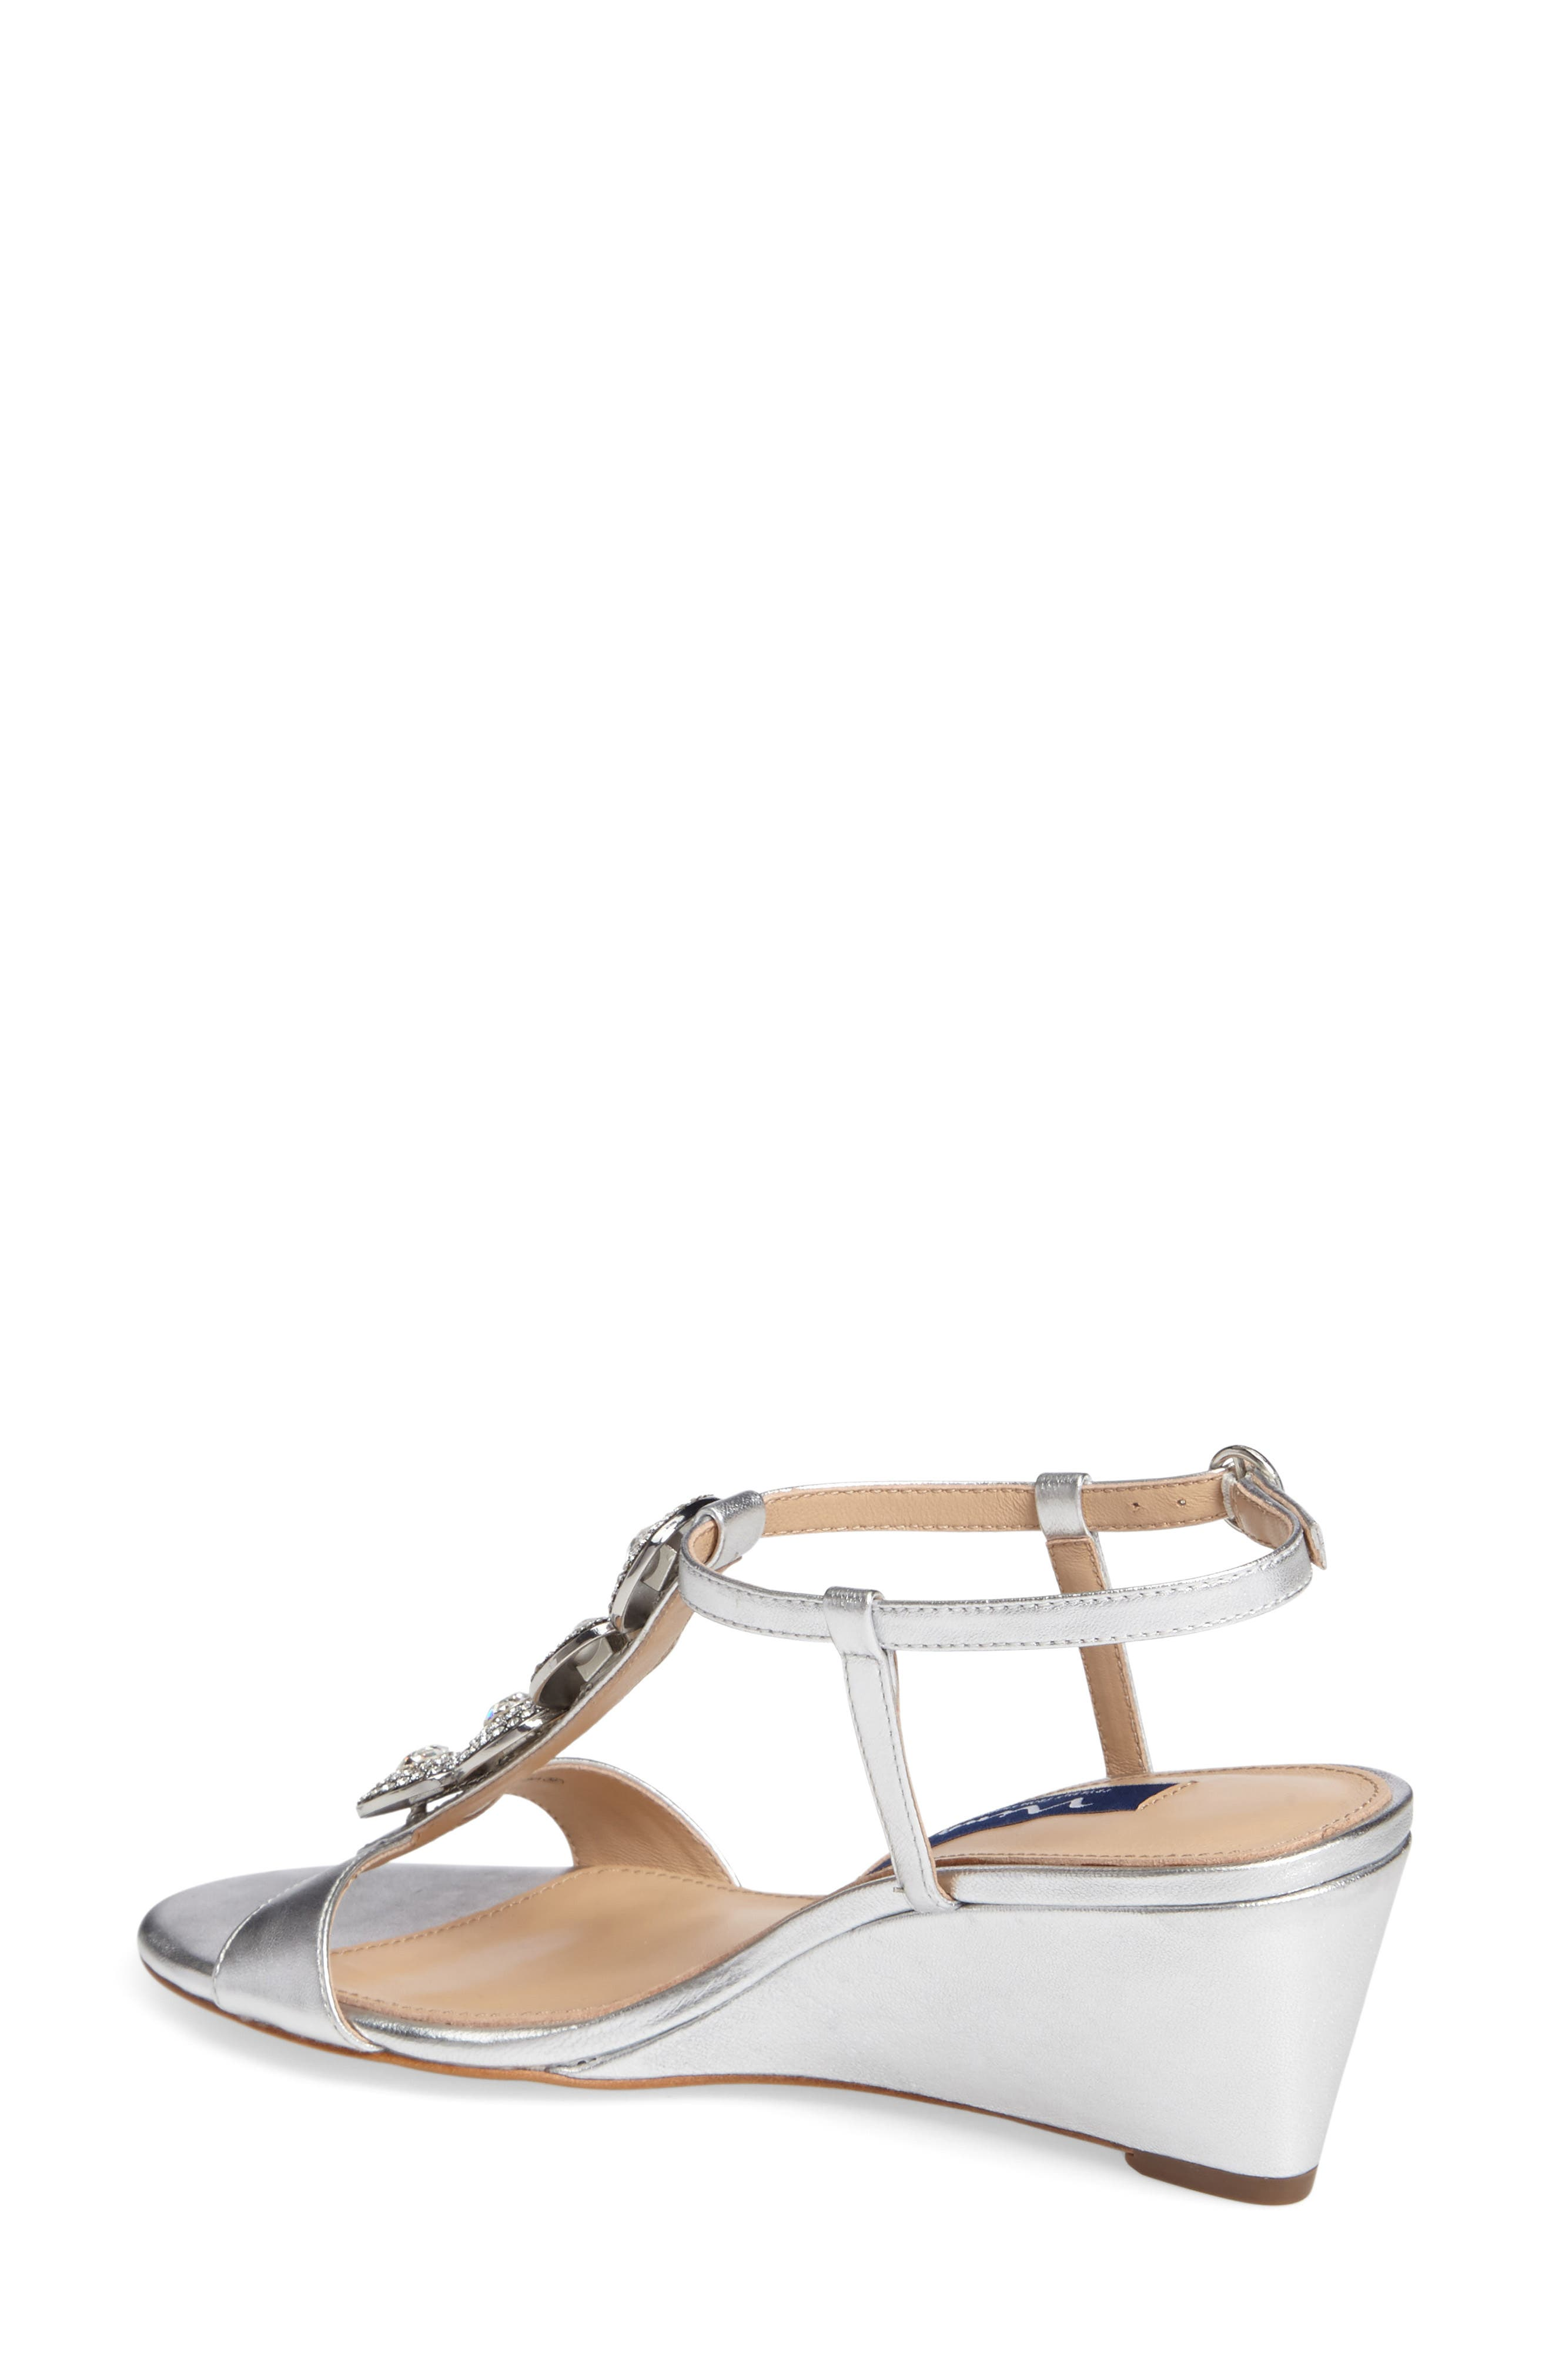 Natania Swarovski Wedge Sandal,                             Alternate thumbnail 2, color,                             043